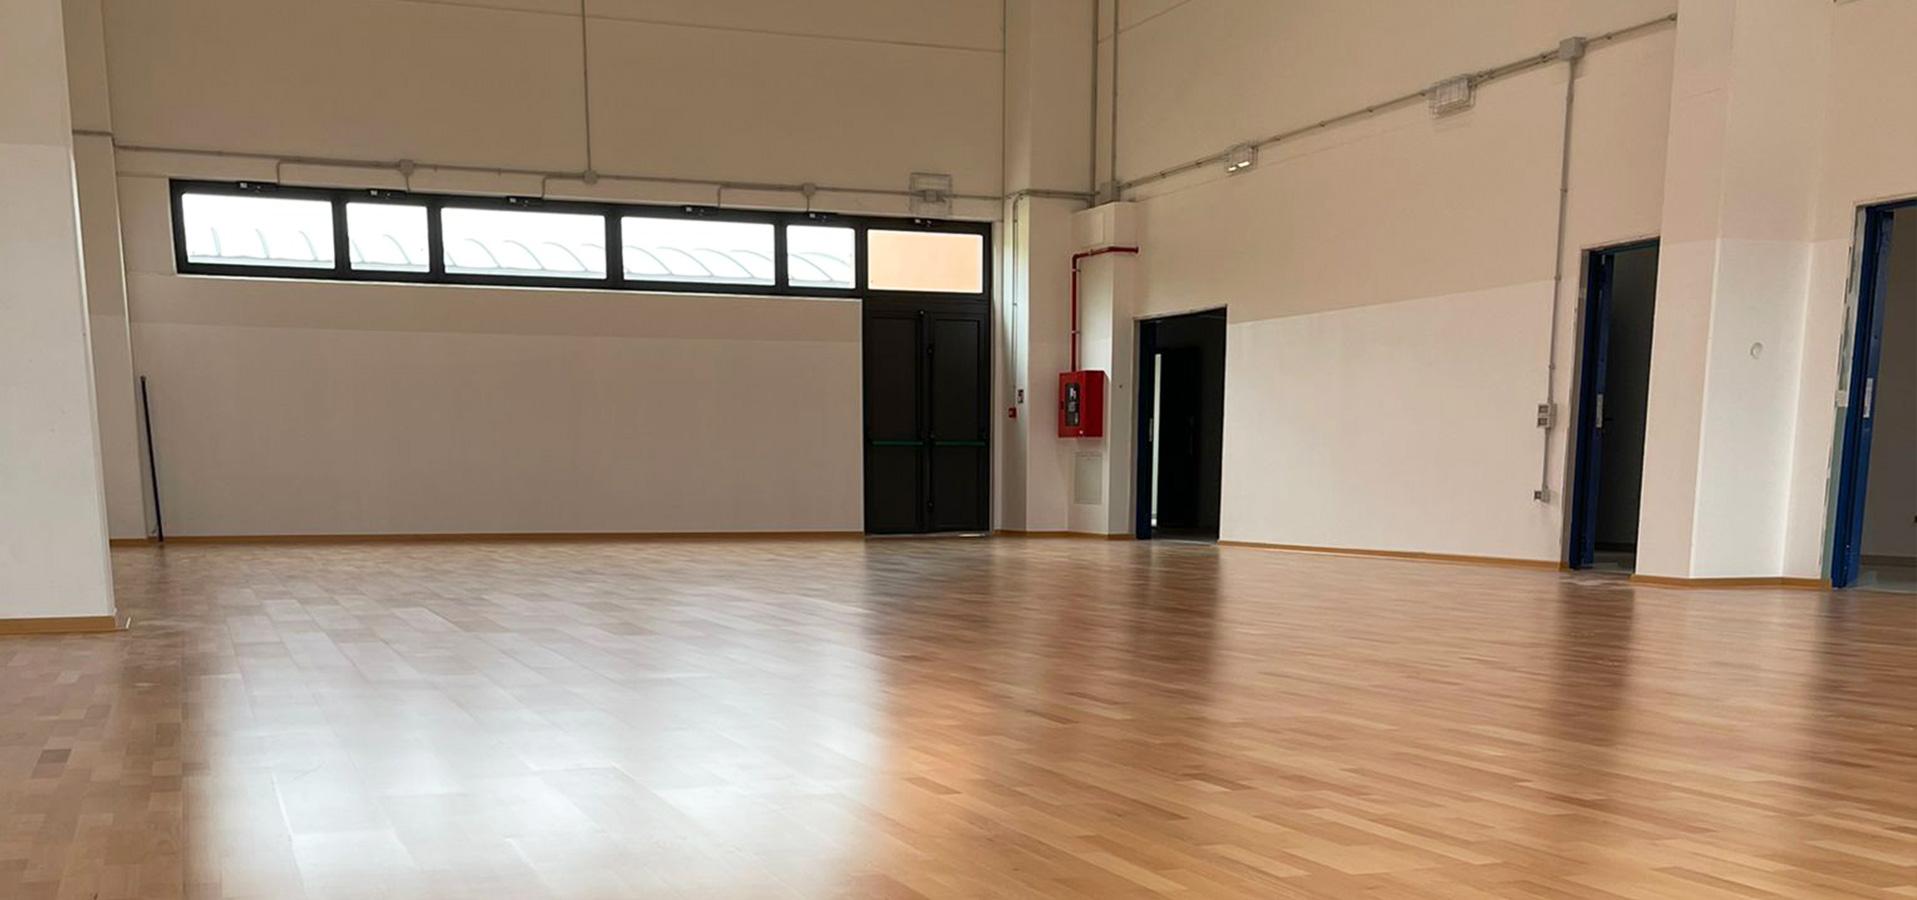 ballan-scuola-5